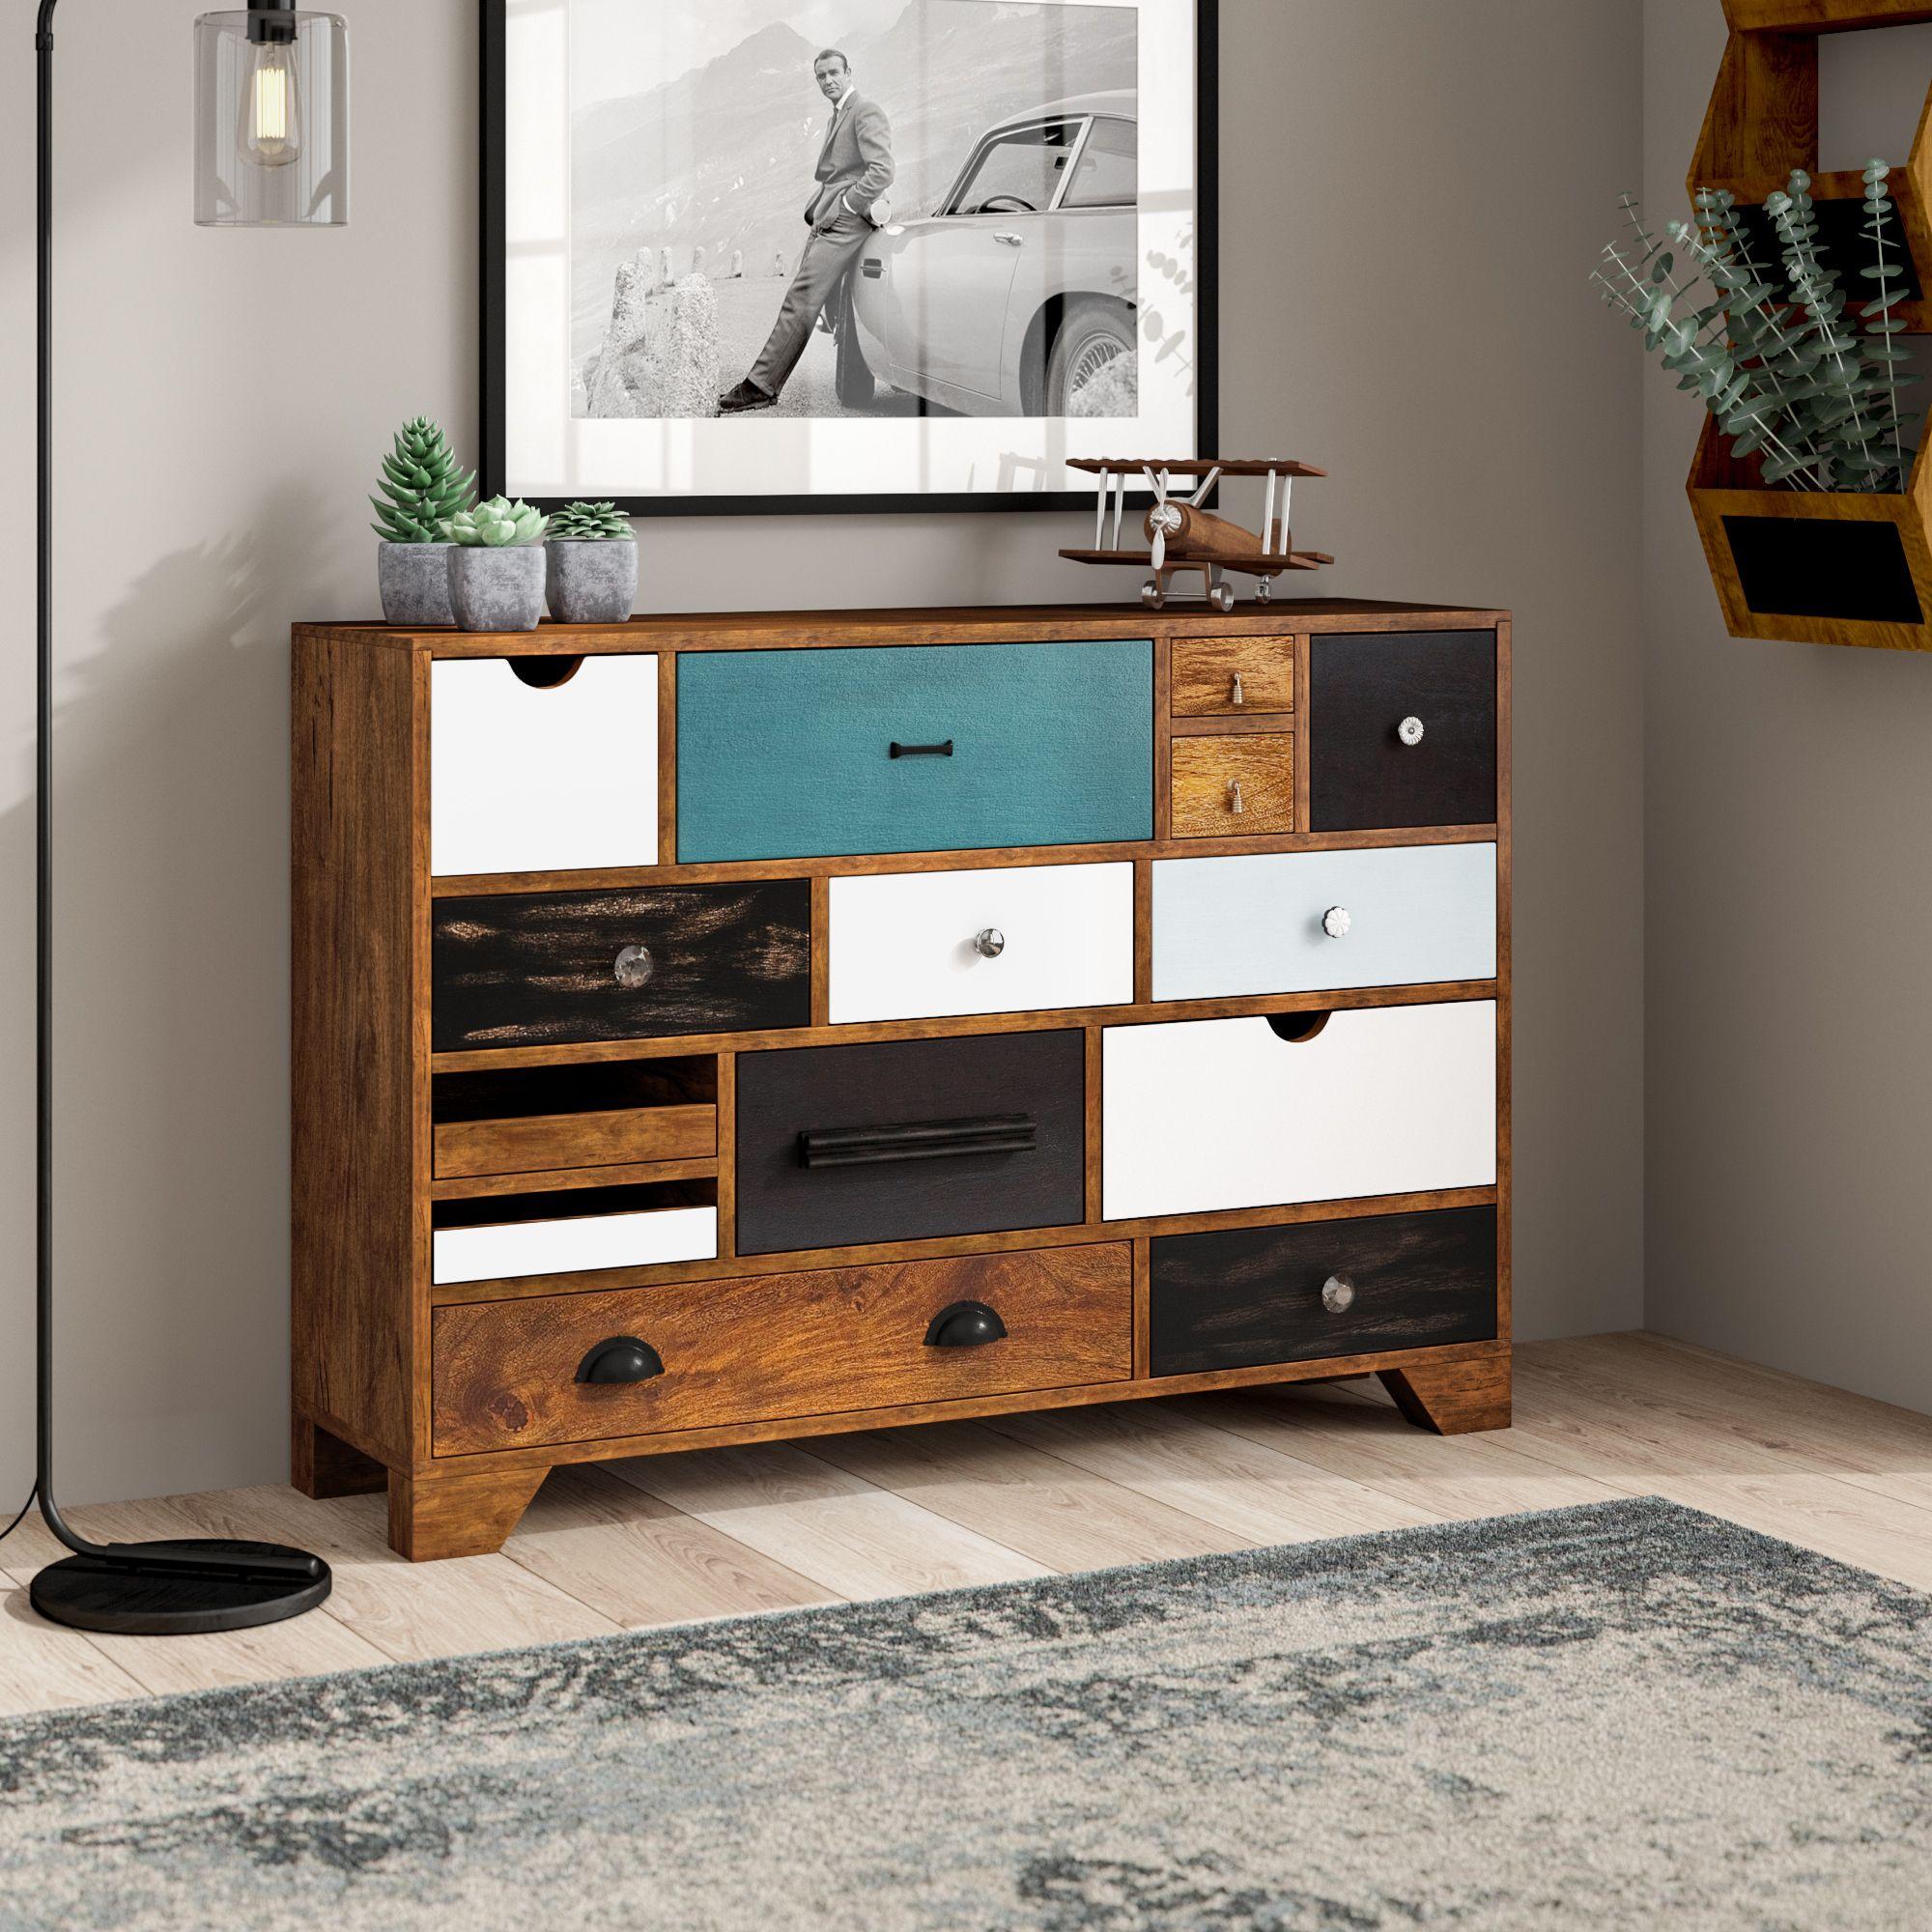 Kare Design Kommode Babalou Chest Of Drawers Furniture